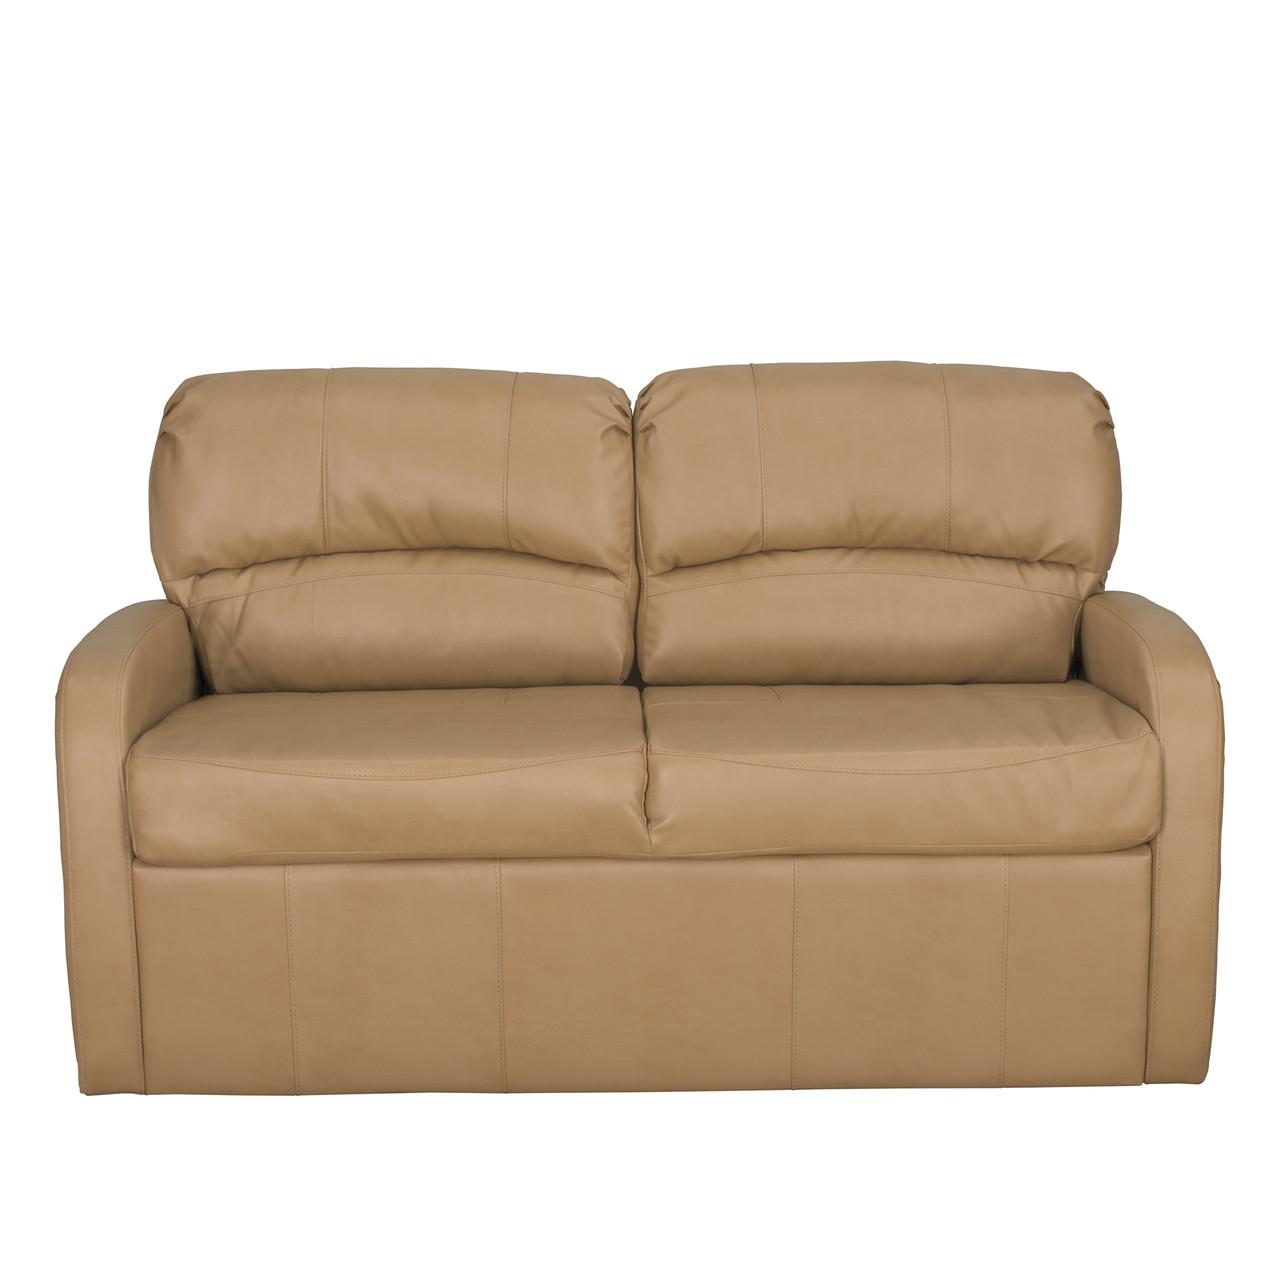 "Jackknife Sectional Sofa Bed: RecPro Charles 70"" Jack Knife RV Sleeper Sofa Furniture"